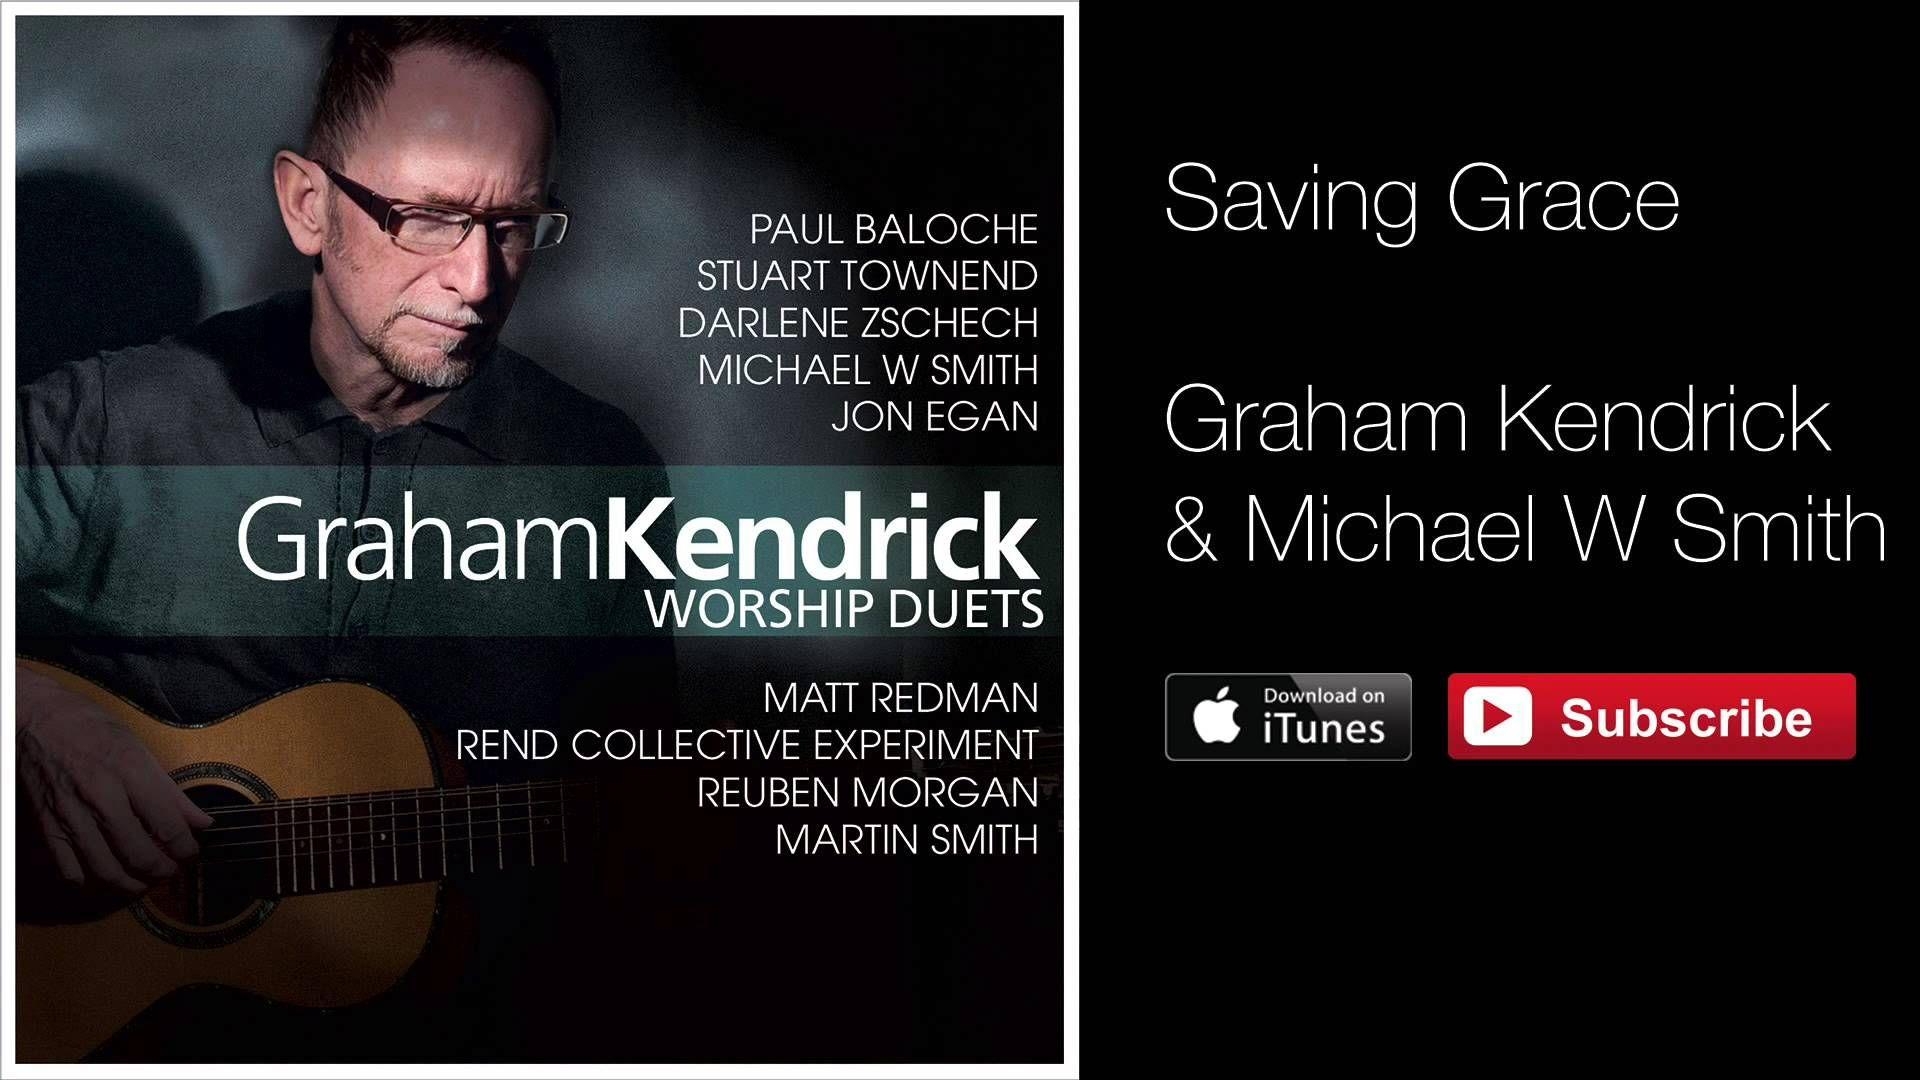 Graham Kendrick & Michael W Smith Saving Grace (from